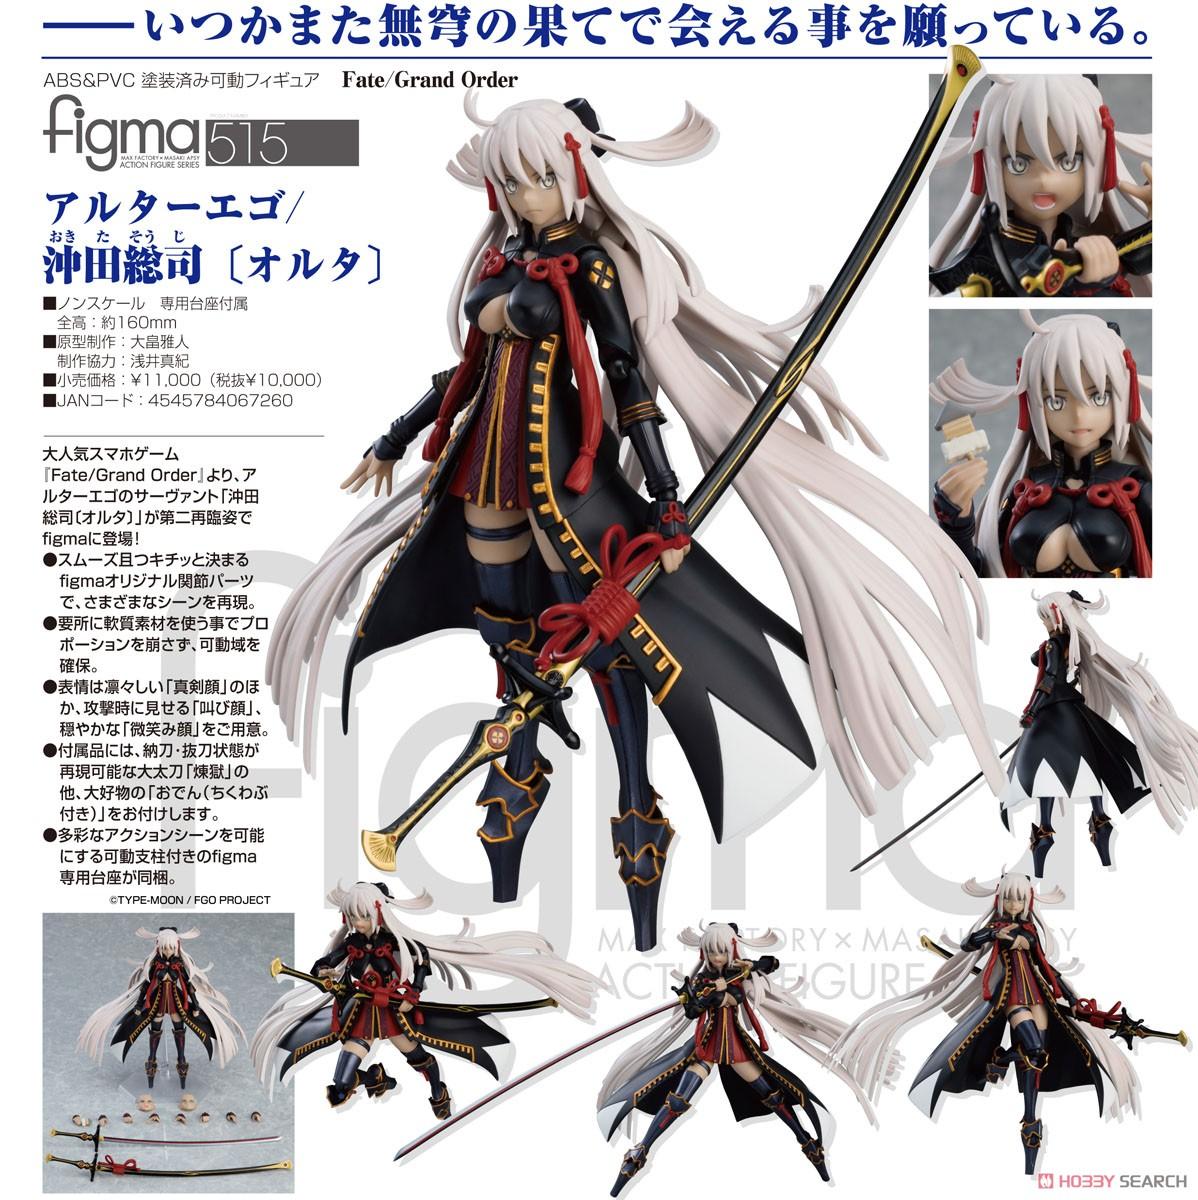 figma『アルターエゴ/沖田総司〔オルタ〕』Fate/Grand Order 可動フィギュア-010